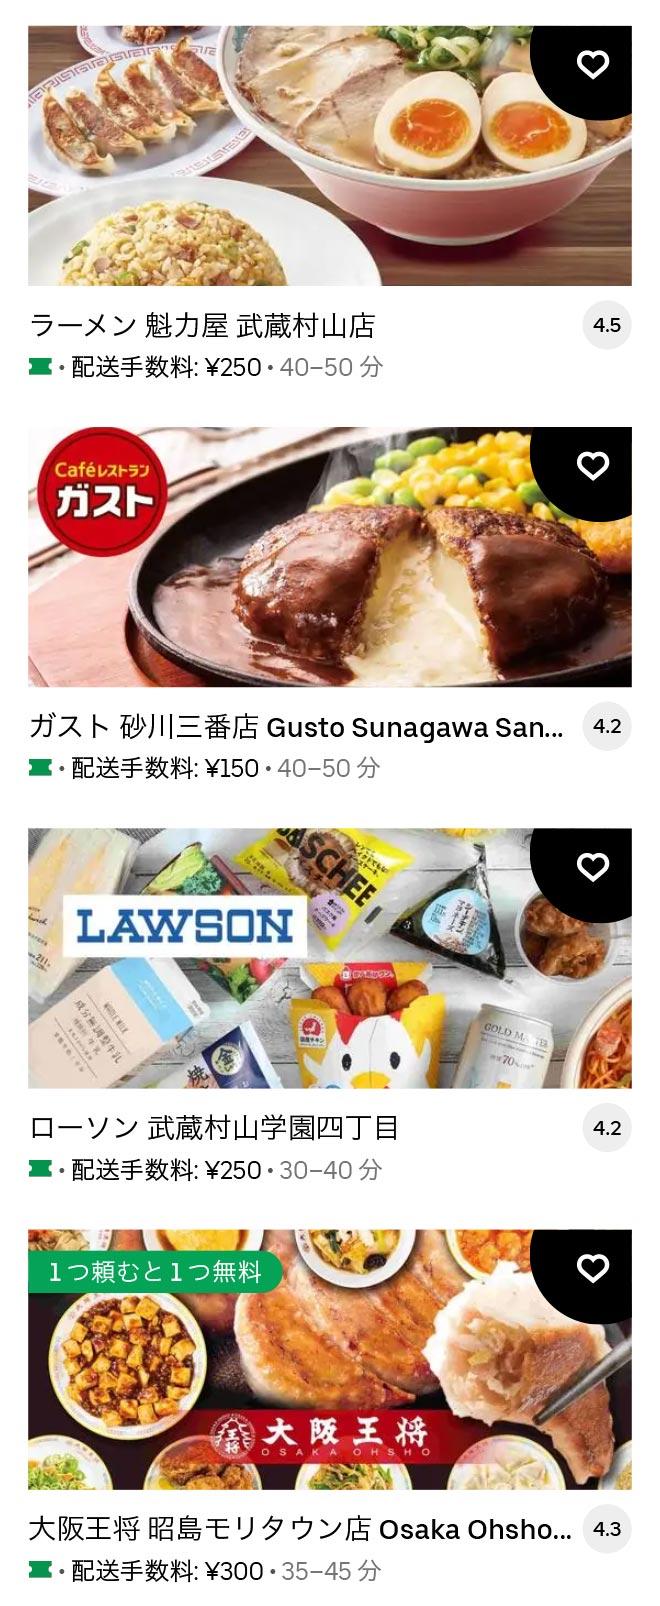 U musashi murayama 2106 05